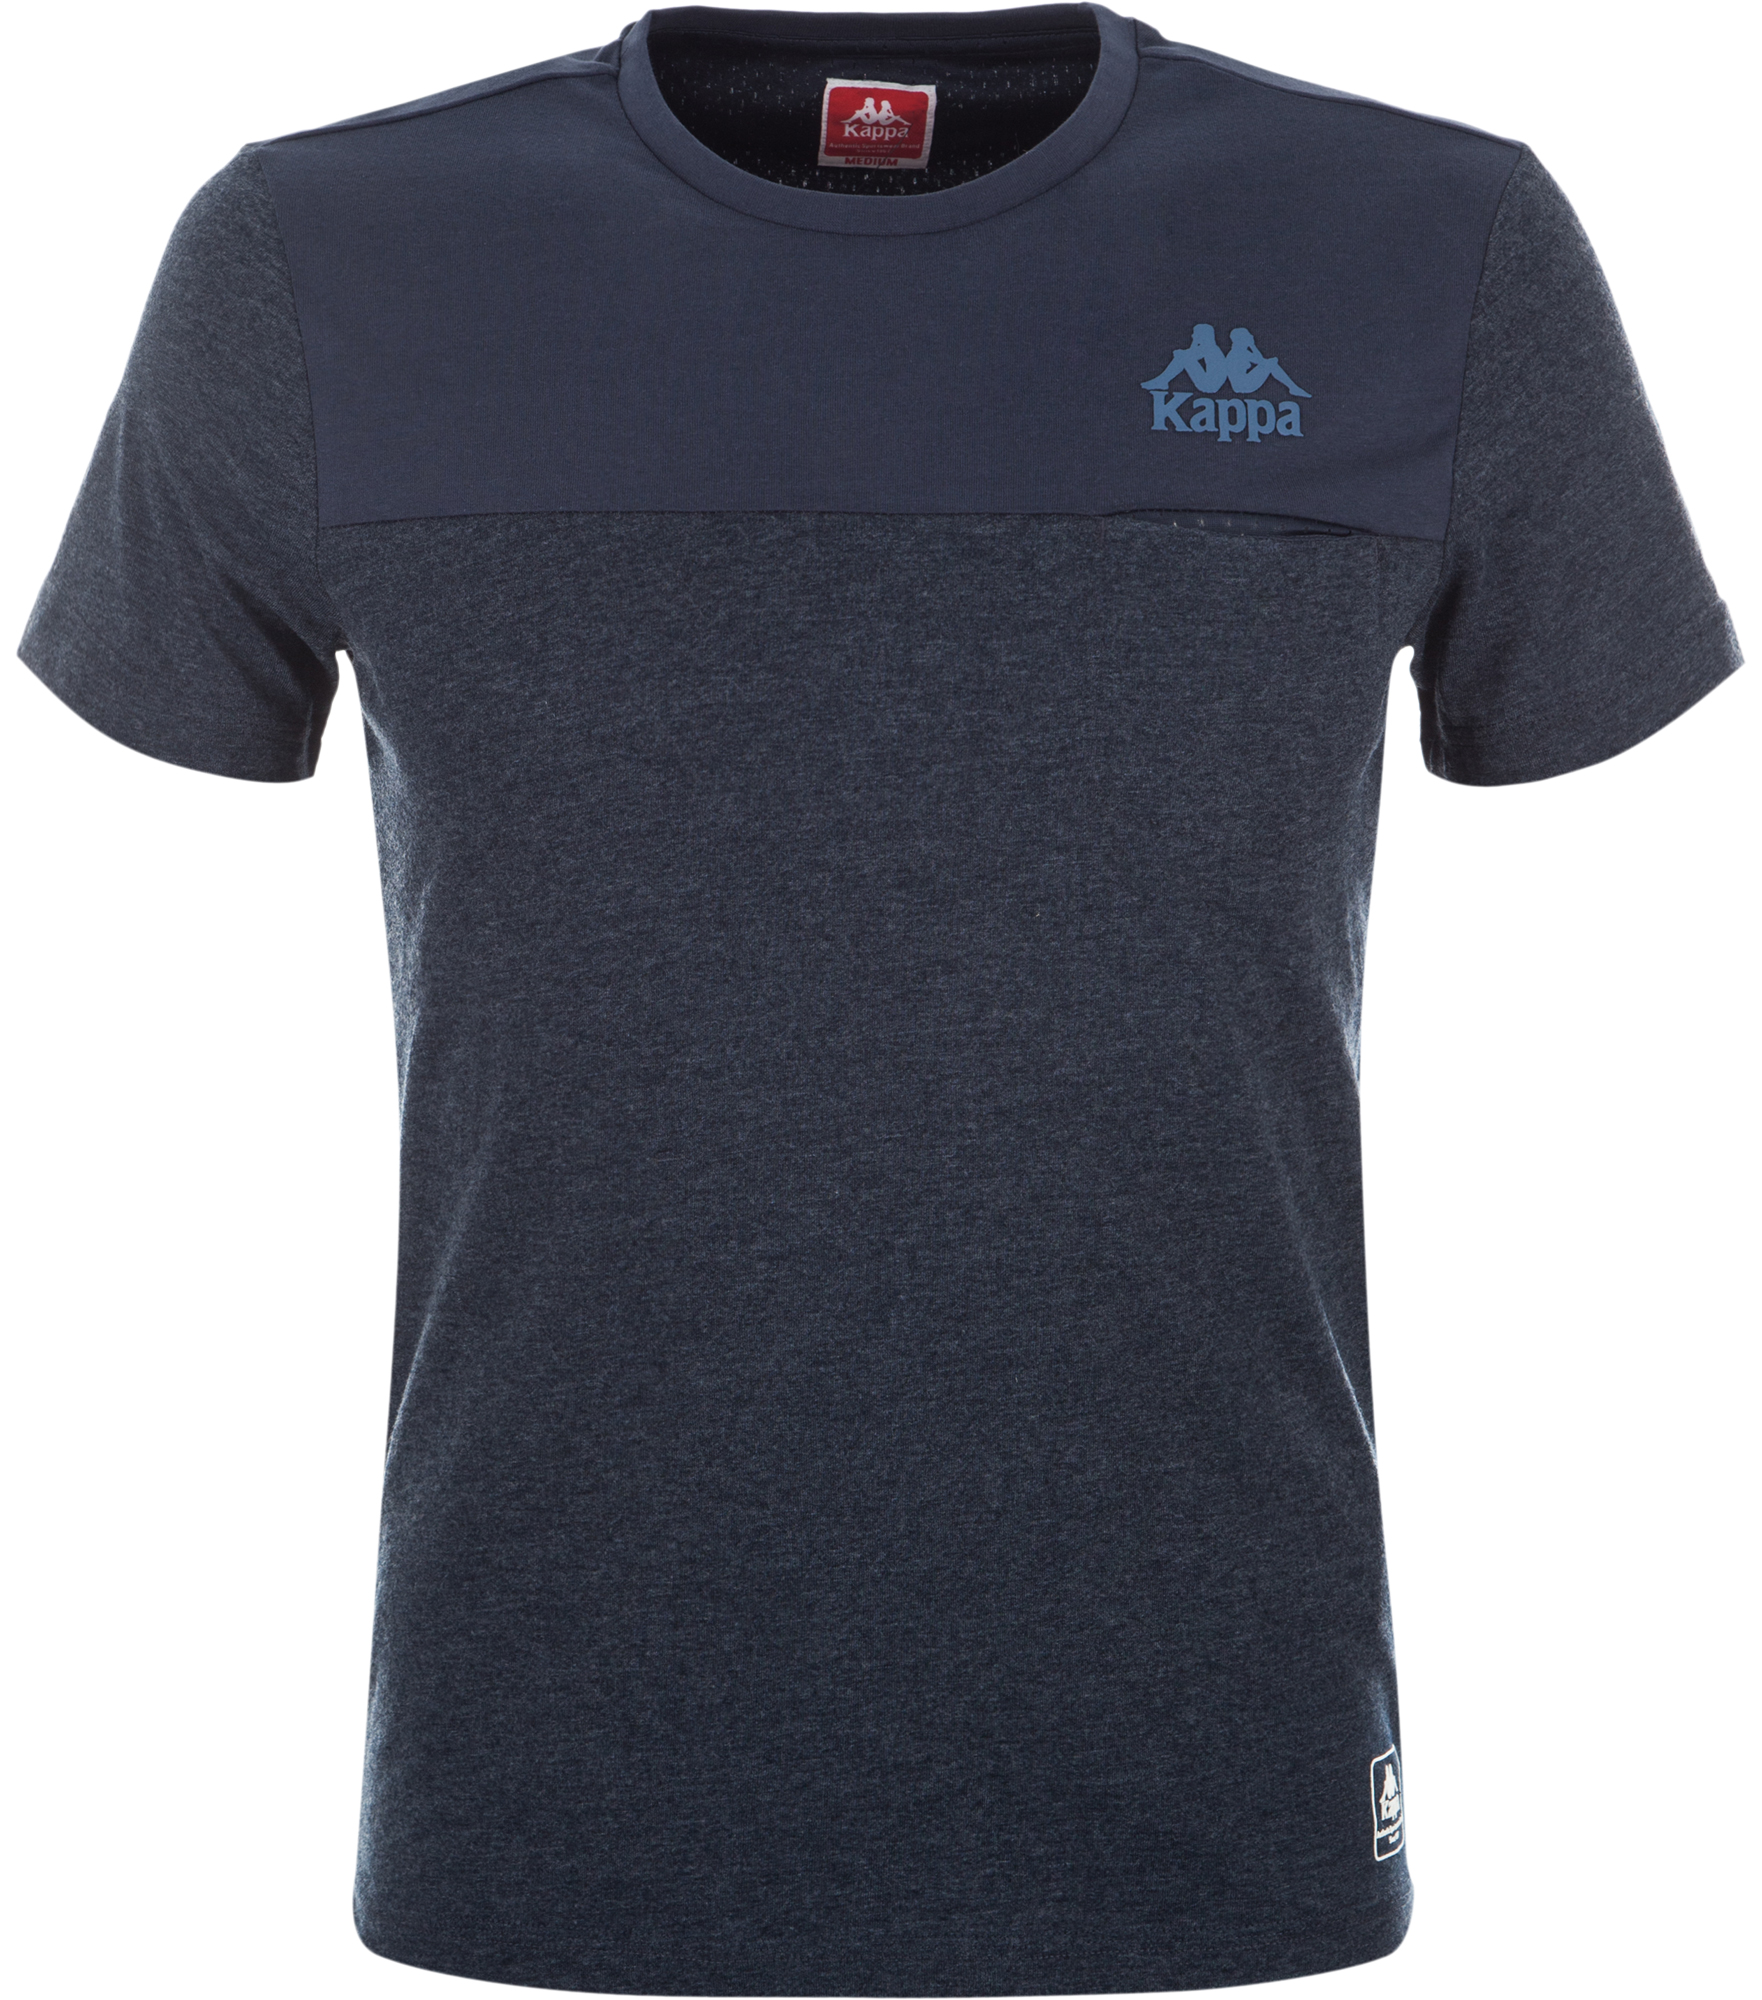 Kappa Футболка мужская Kappa футболка мужская kappa kappa